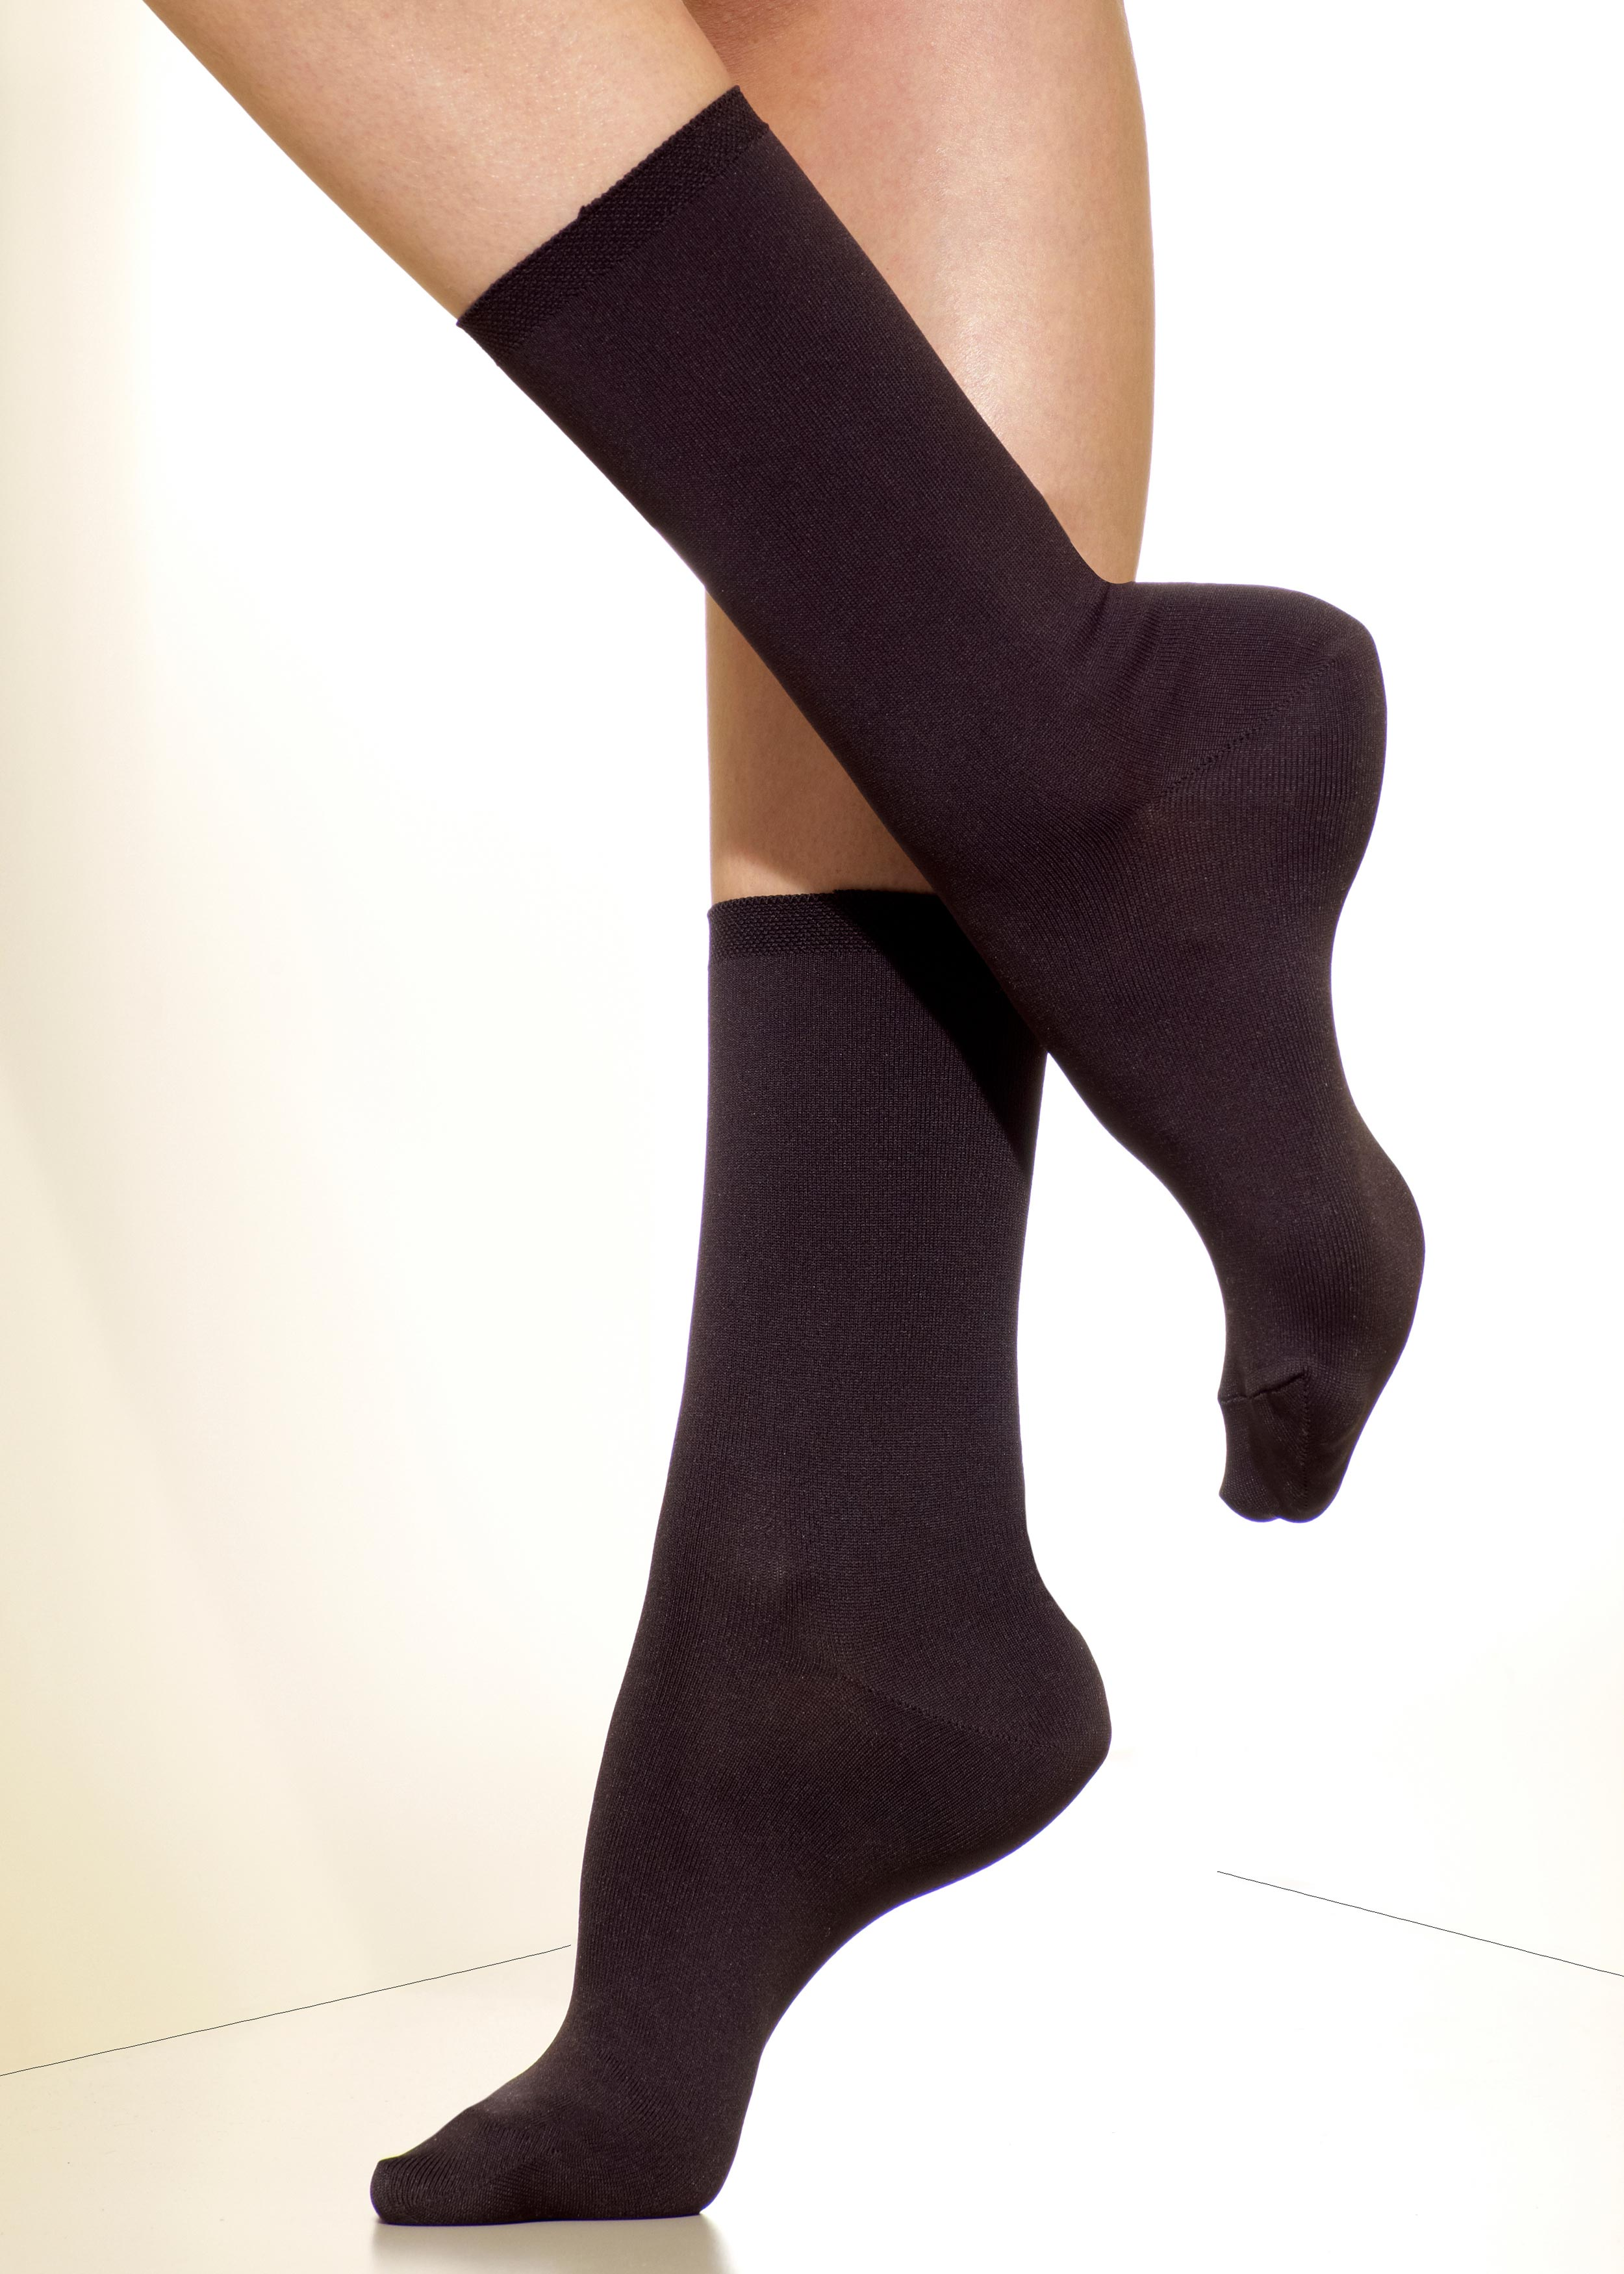 d5a0df802 Silkies Microfiber Crew Socks (Matte Finish) | Four Fashion Shades ...